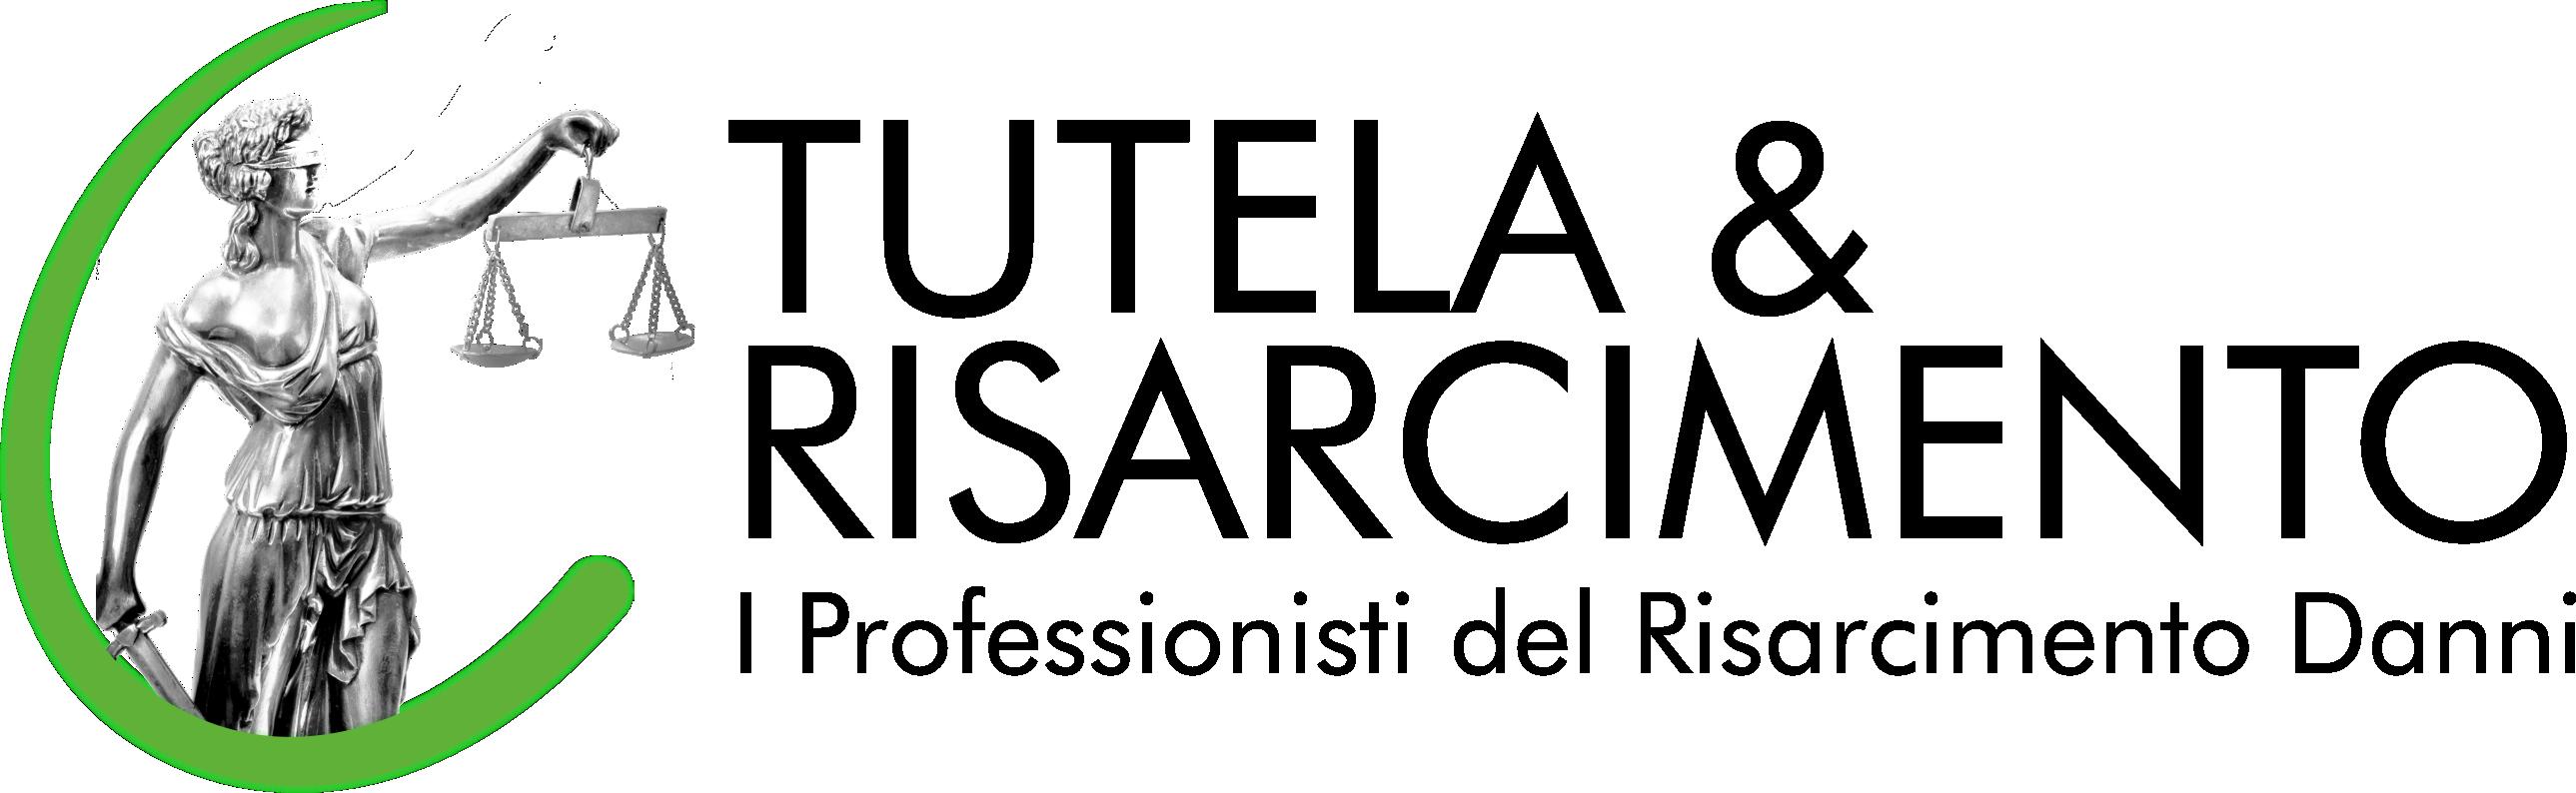 https://www.tutelaerisarcimento.com/wp-content/uploads/2019/11/tr_logo_w.png